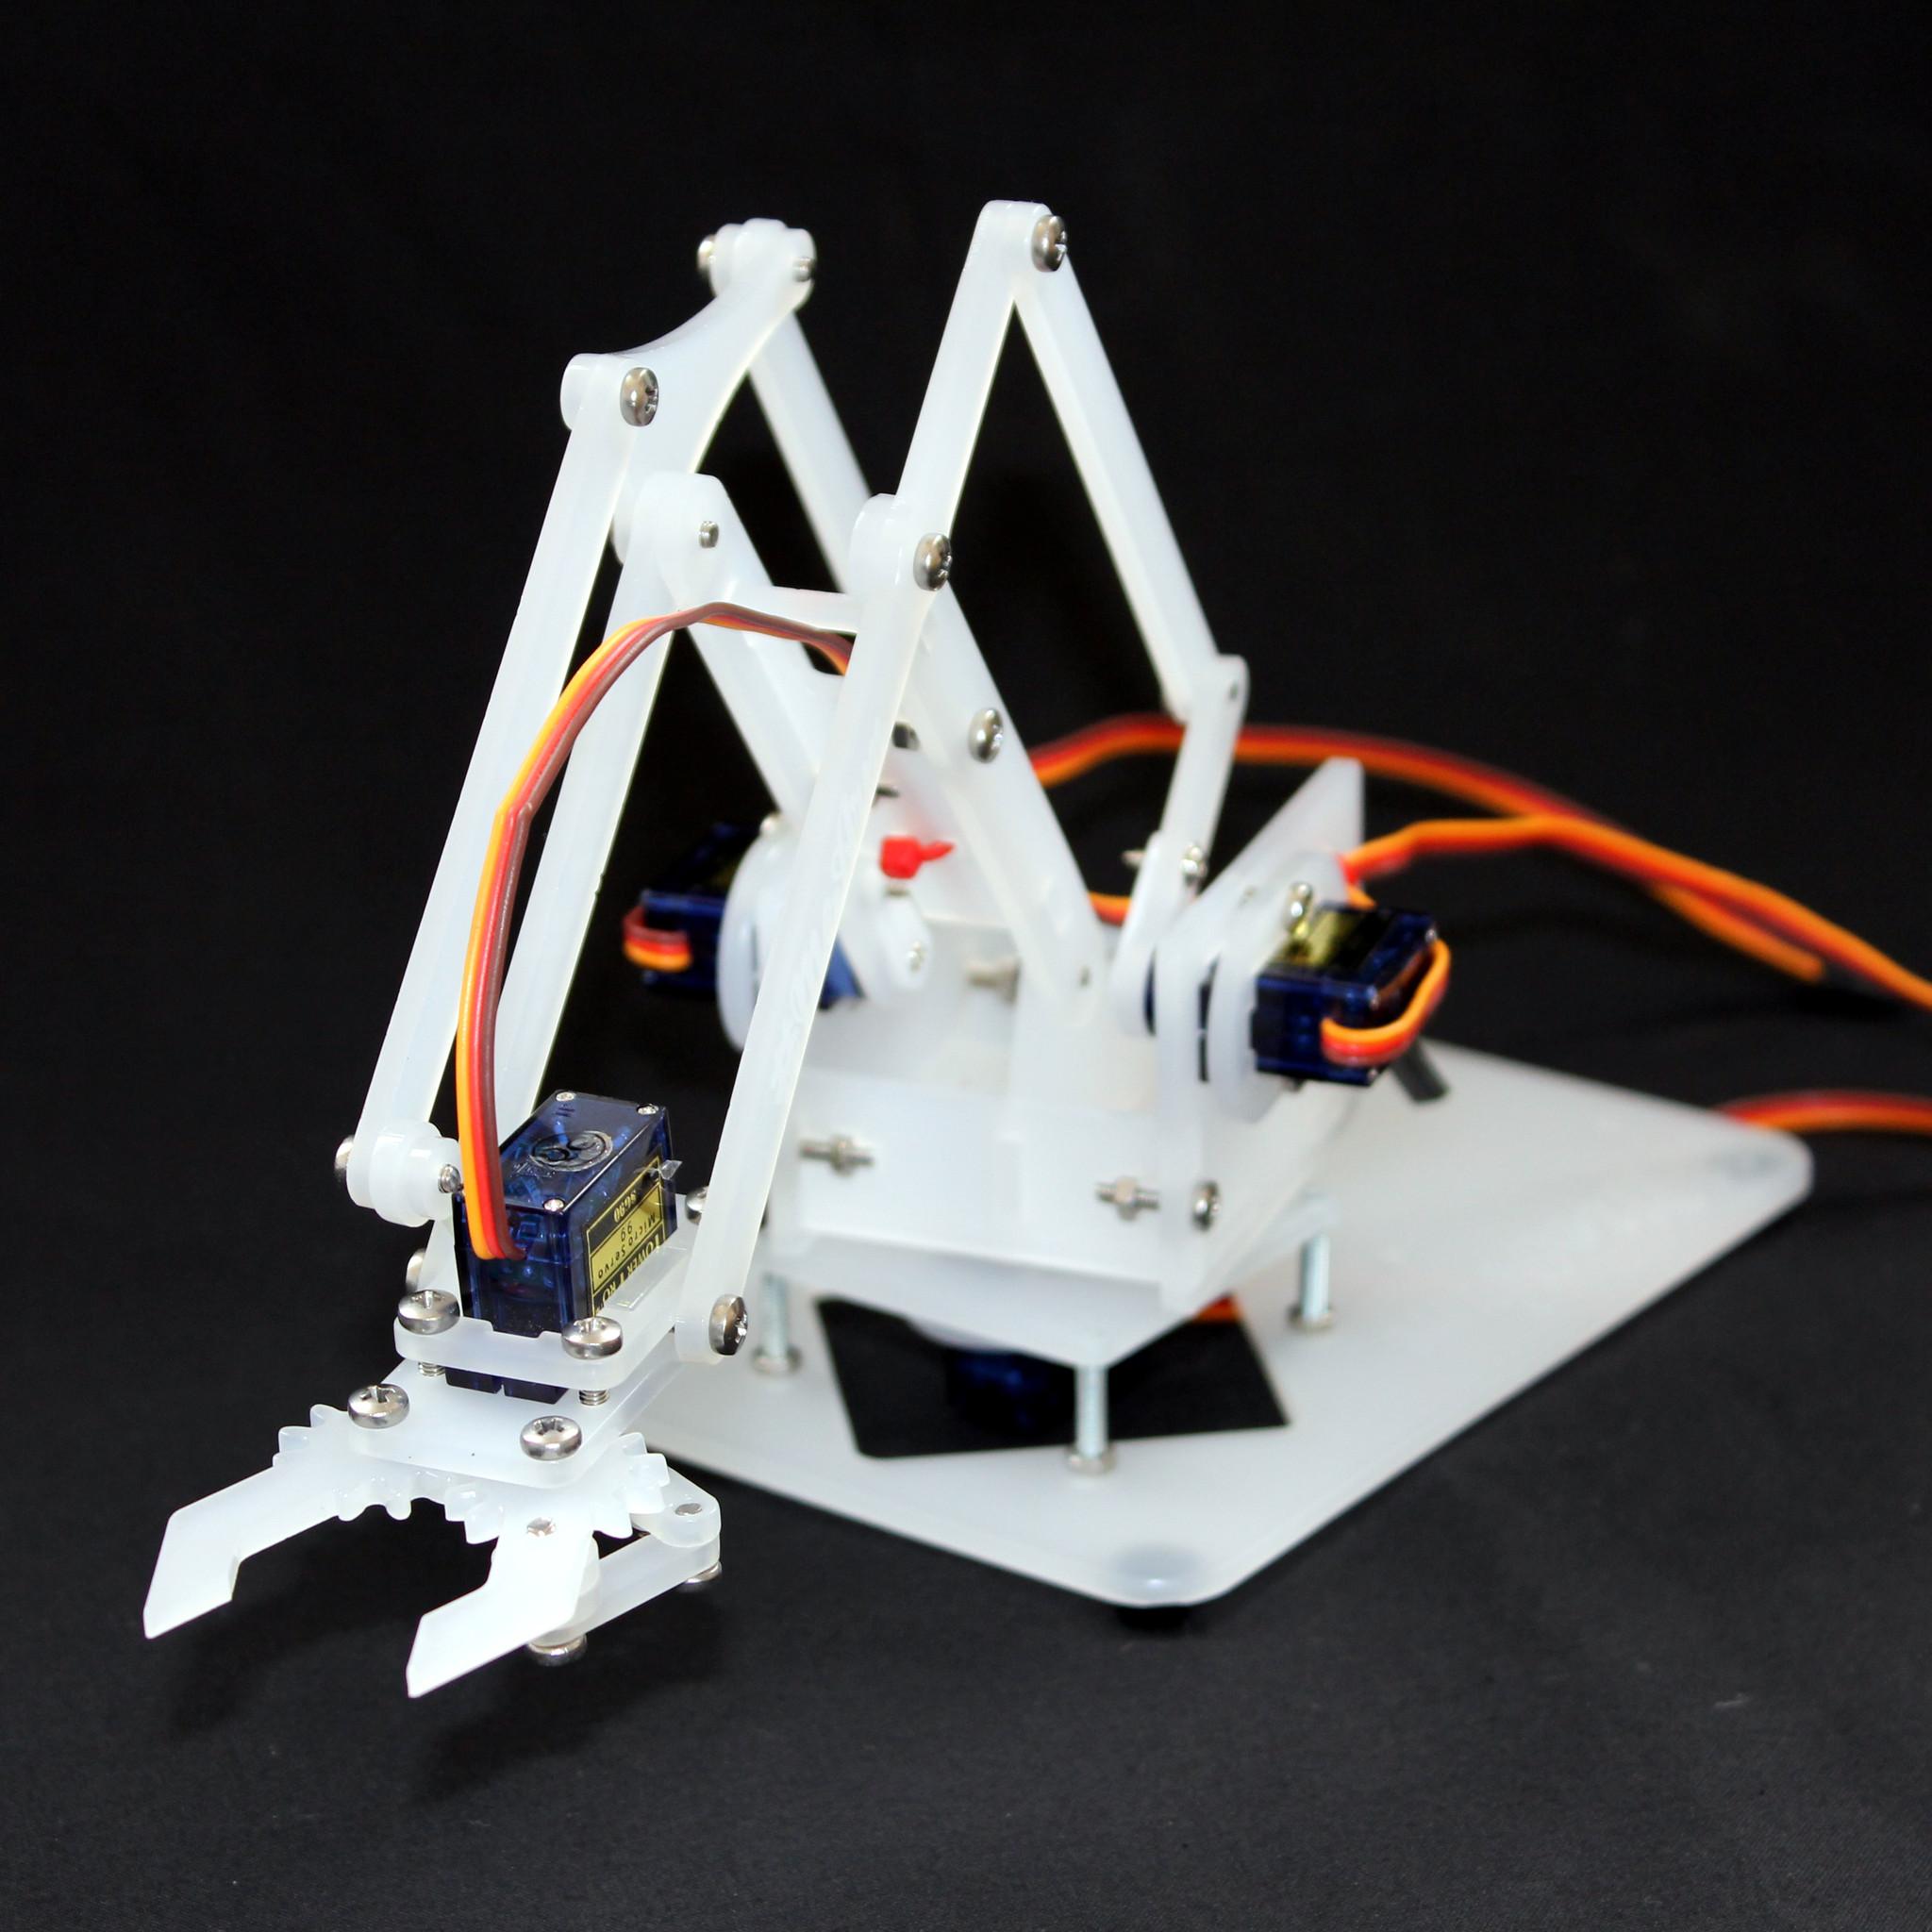 Mearm pocket sized industrial robotics for everybody